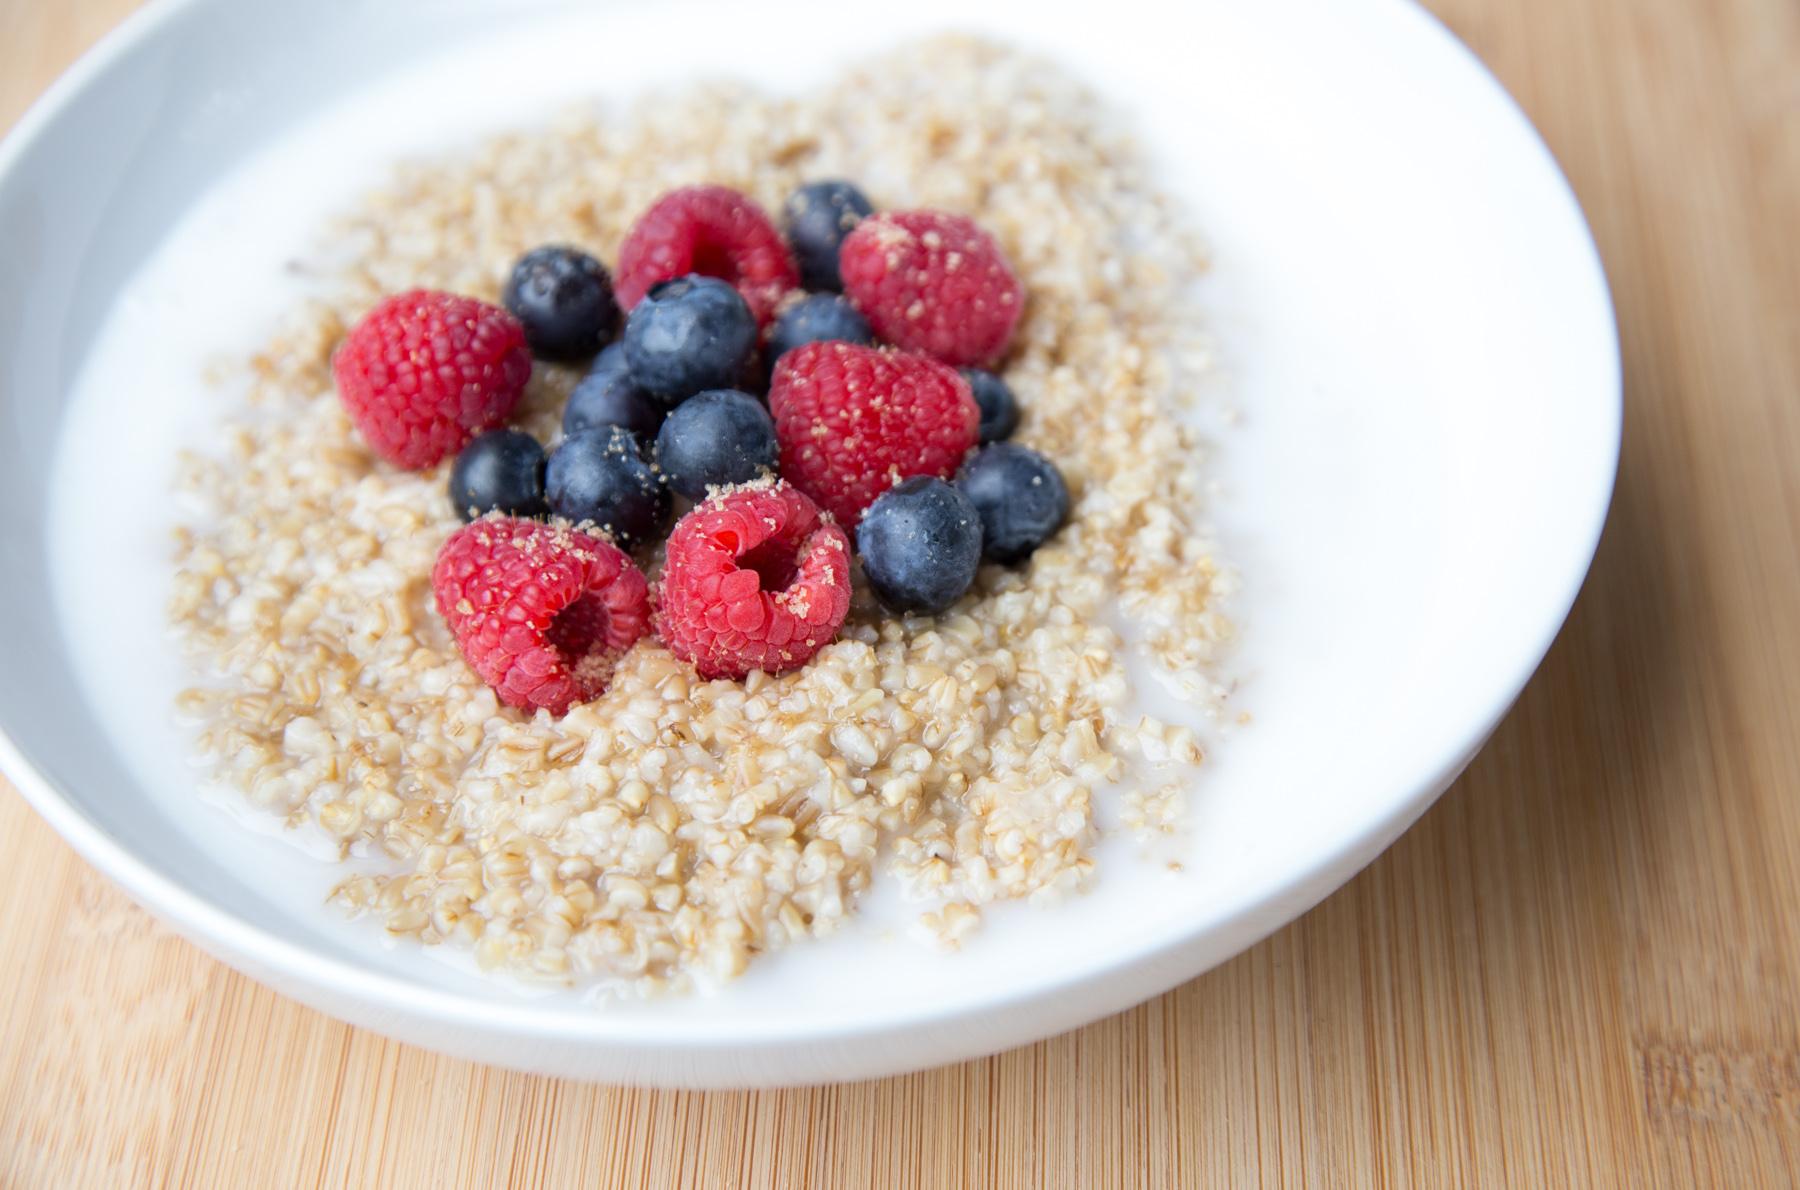 instant-pot-steel-cut-oats-with-berries